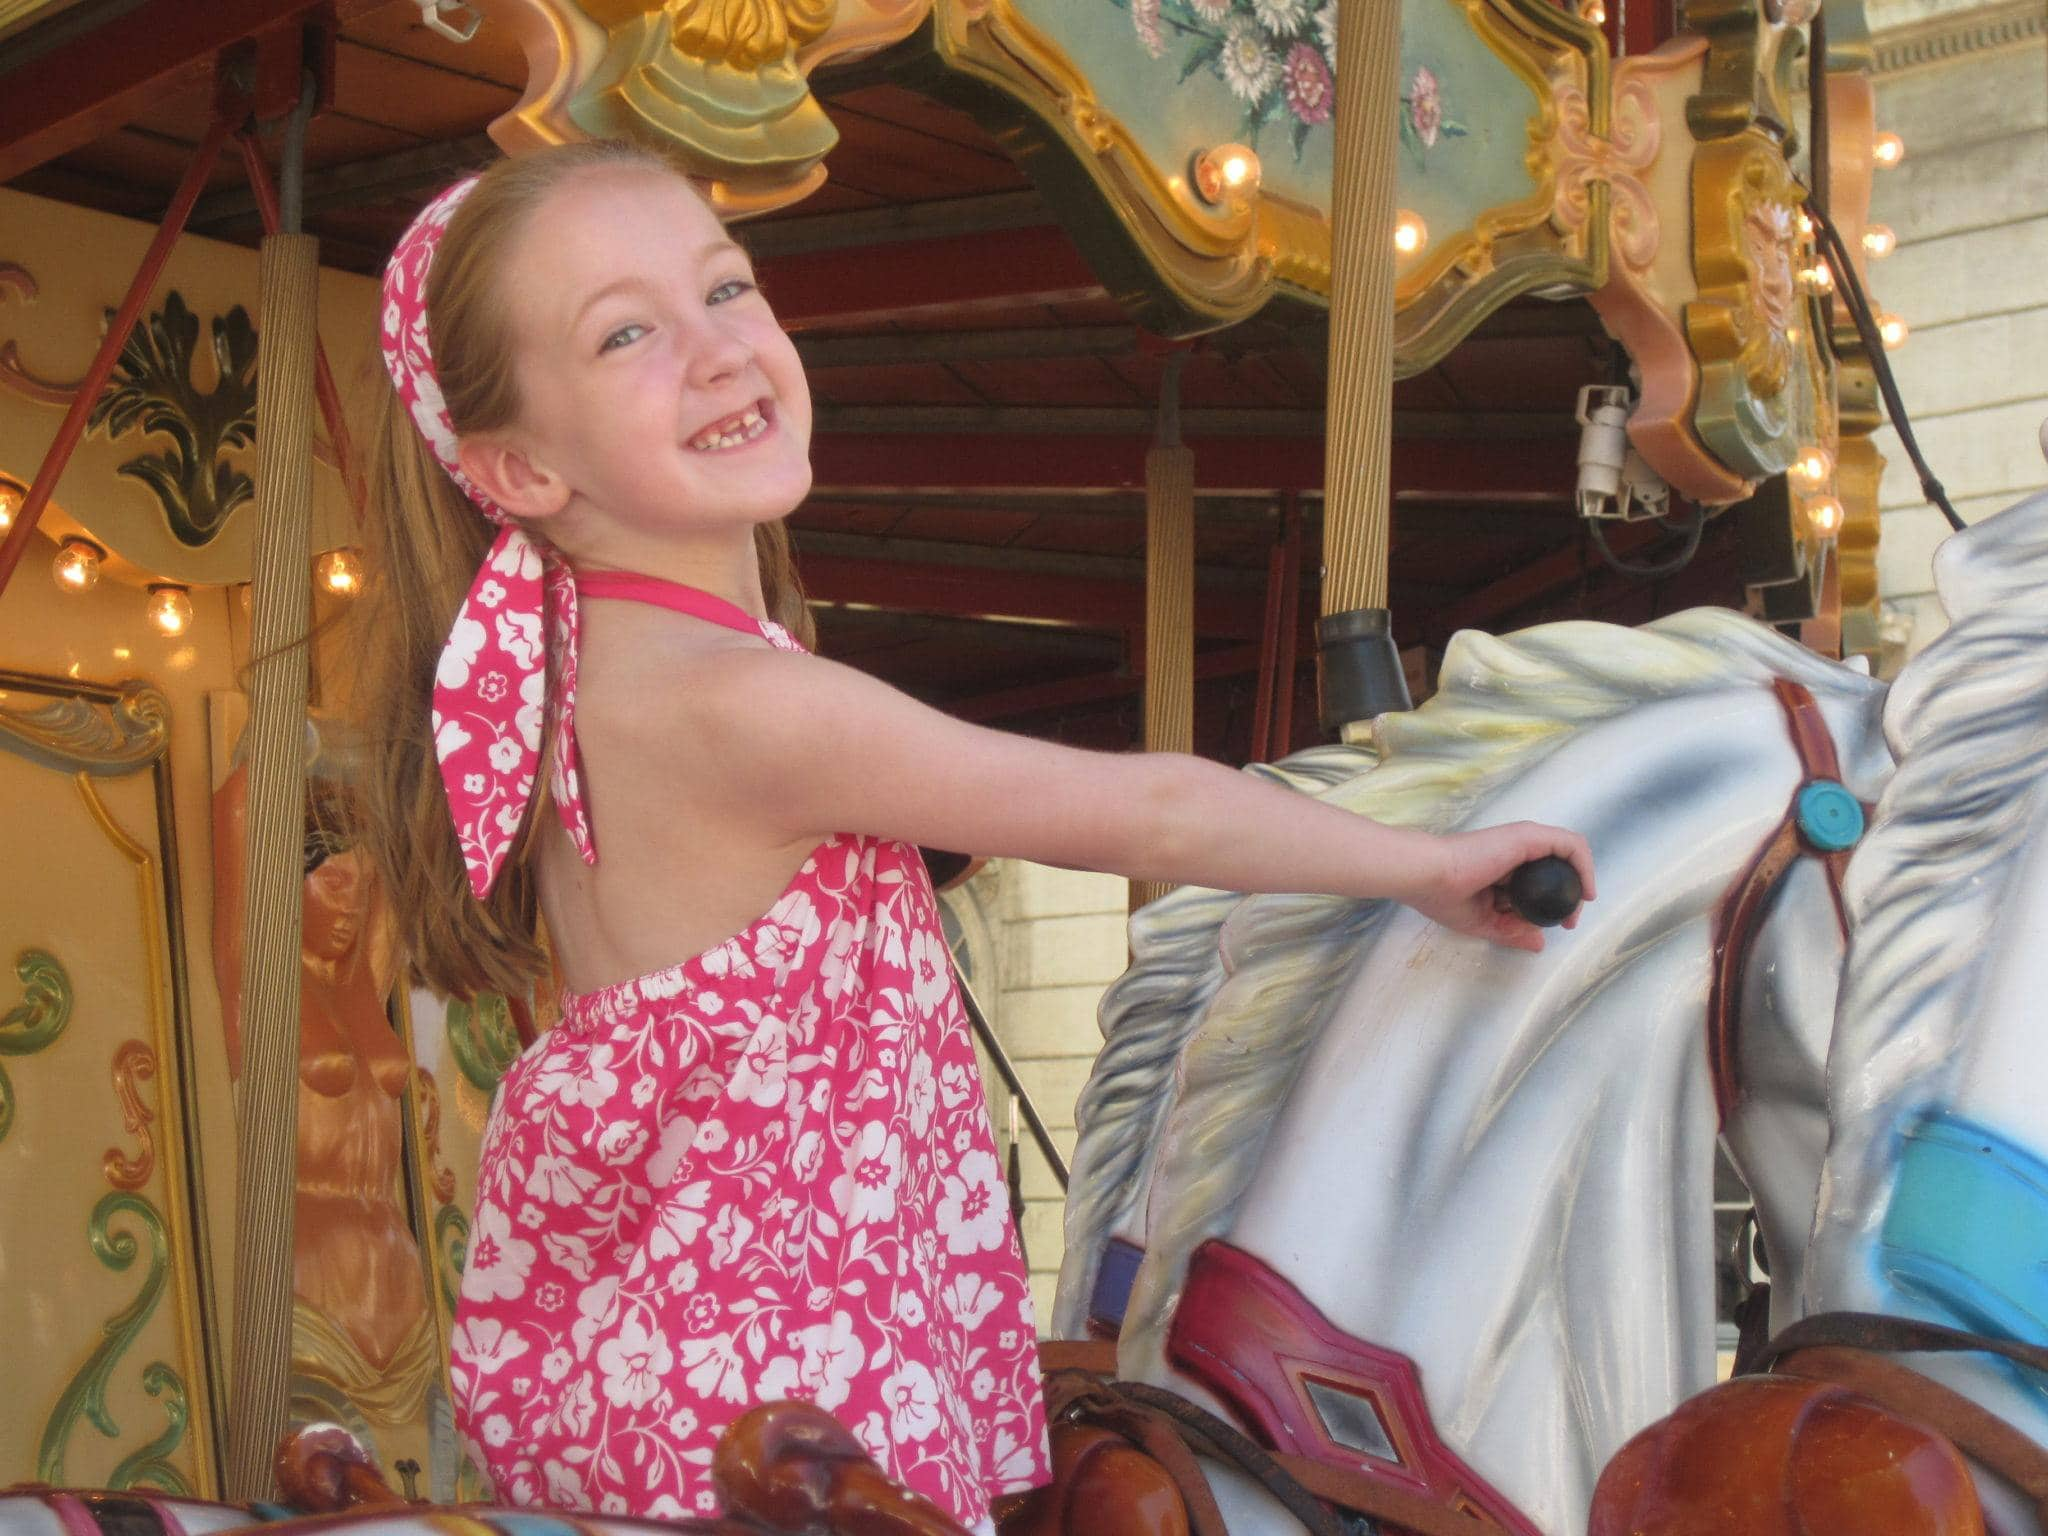 Carousel in Avignon